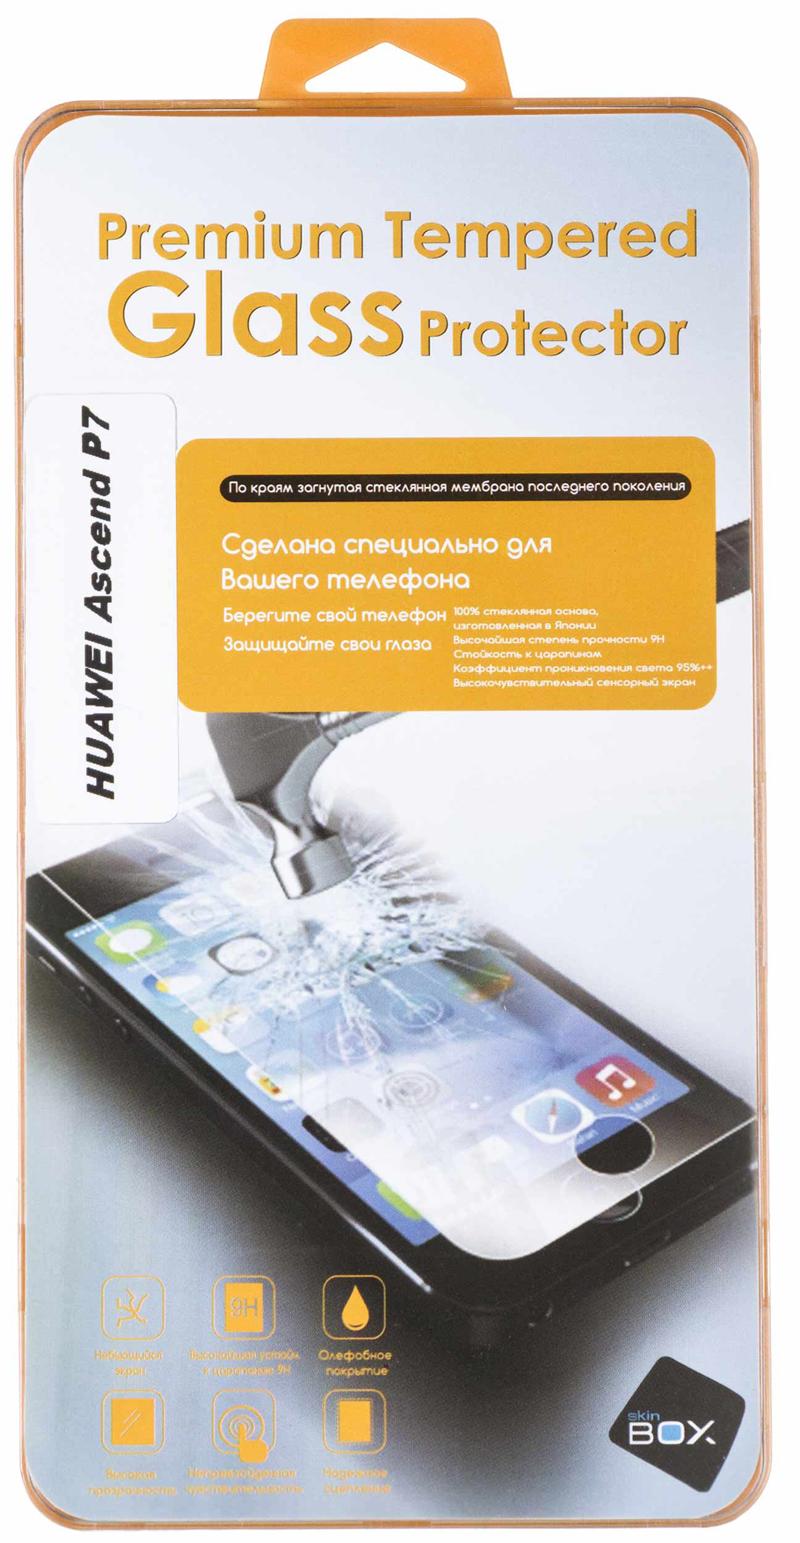 SkinBox ��� Huawei Ascend P7 (0.3mm 2.5D) ���������